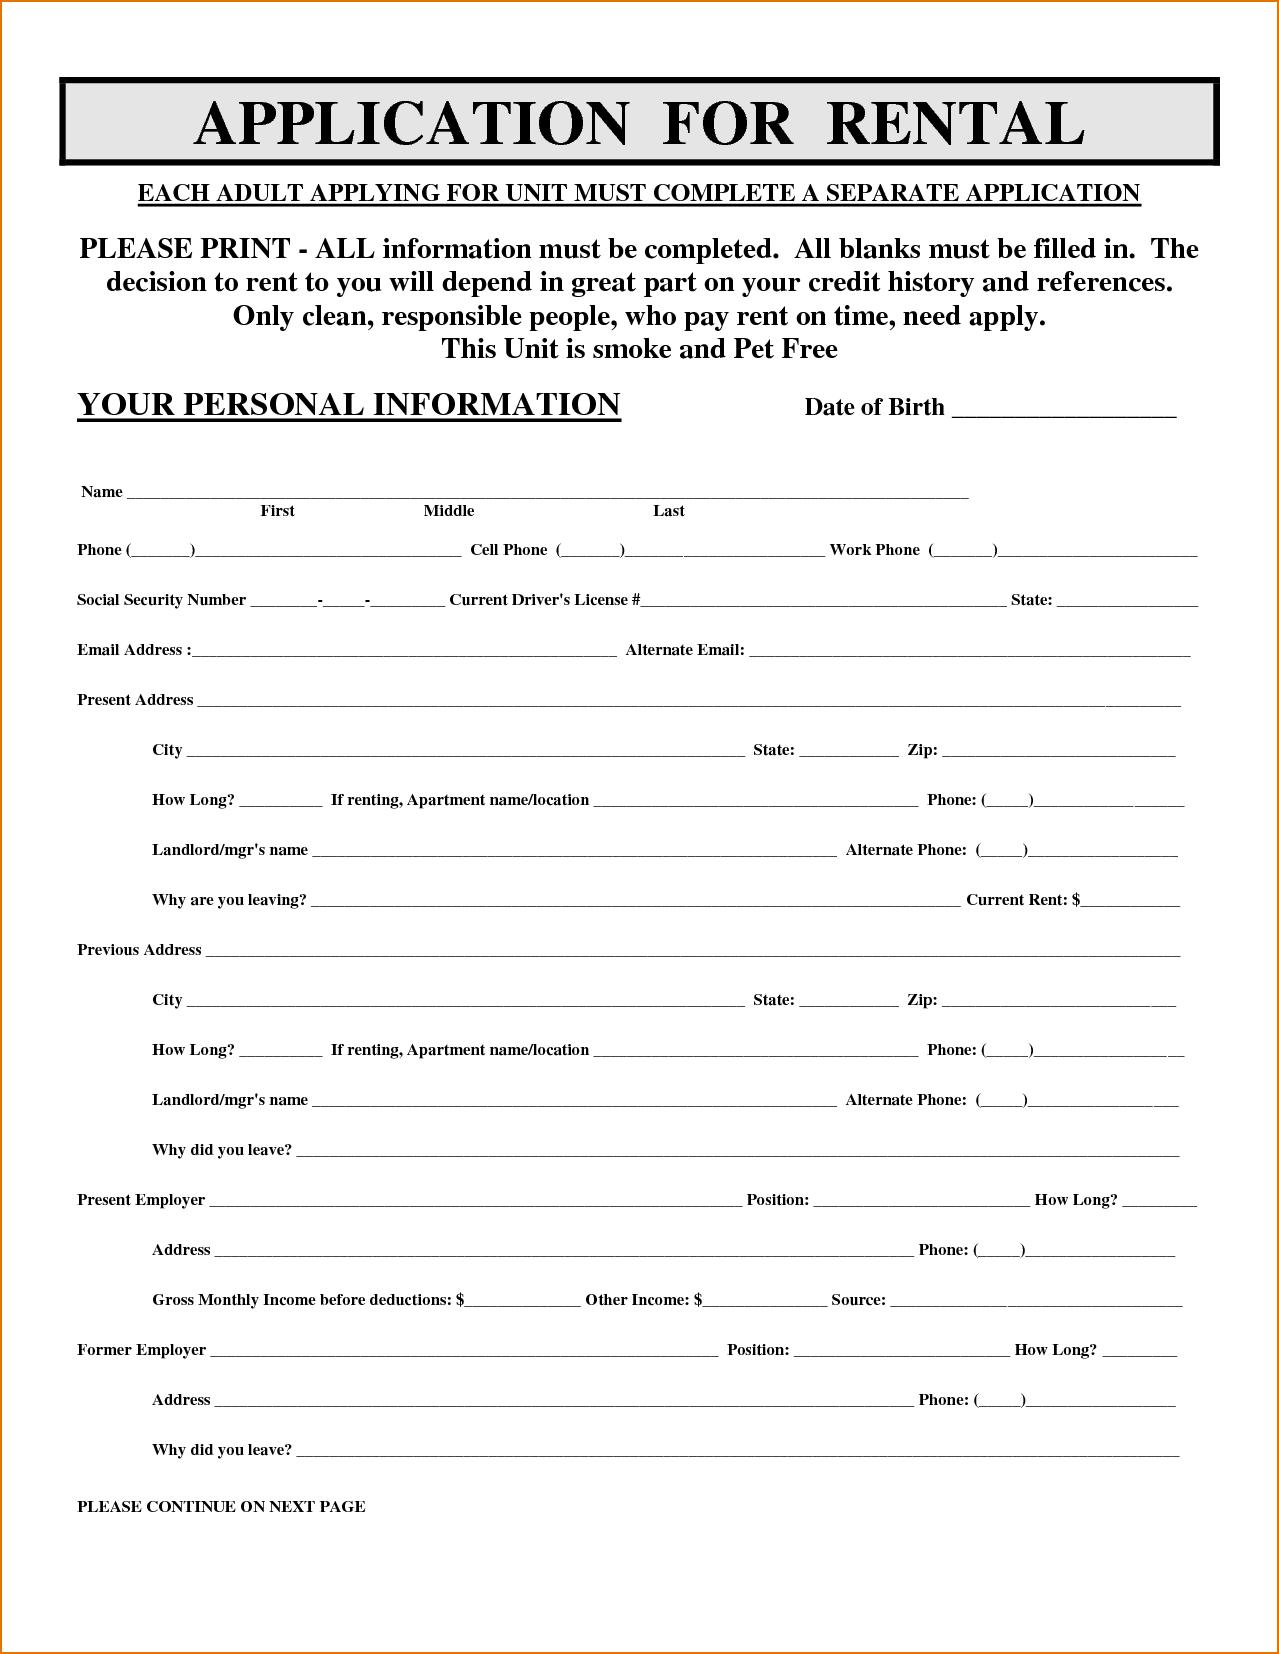 New Simple Rental Application form xls xlsformat